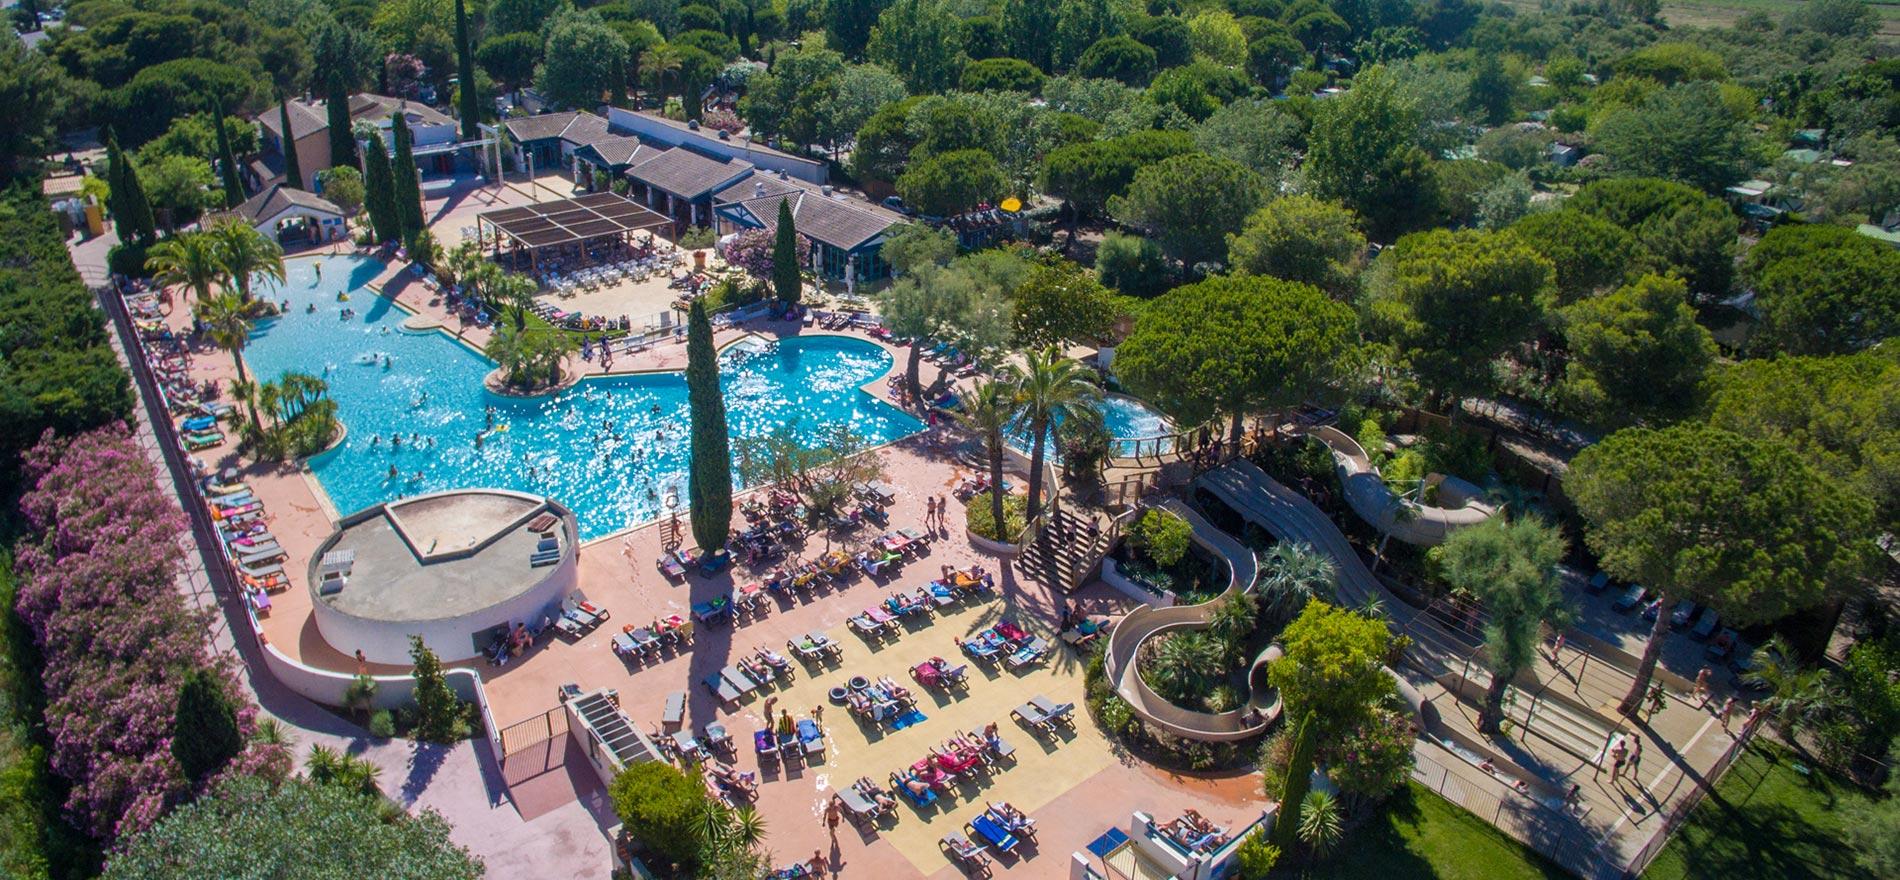 Restaurant Hotel Camargue France